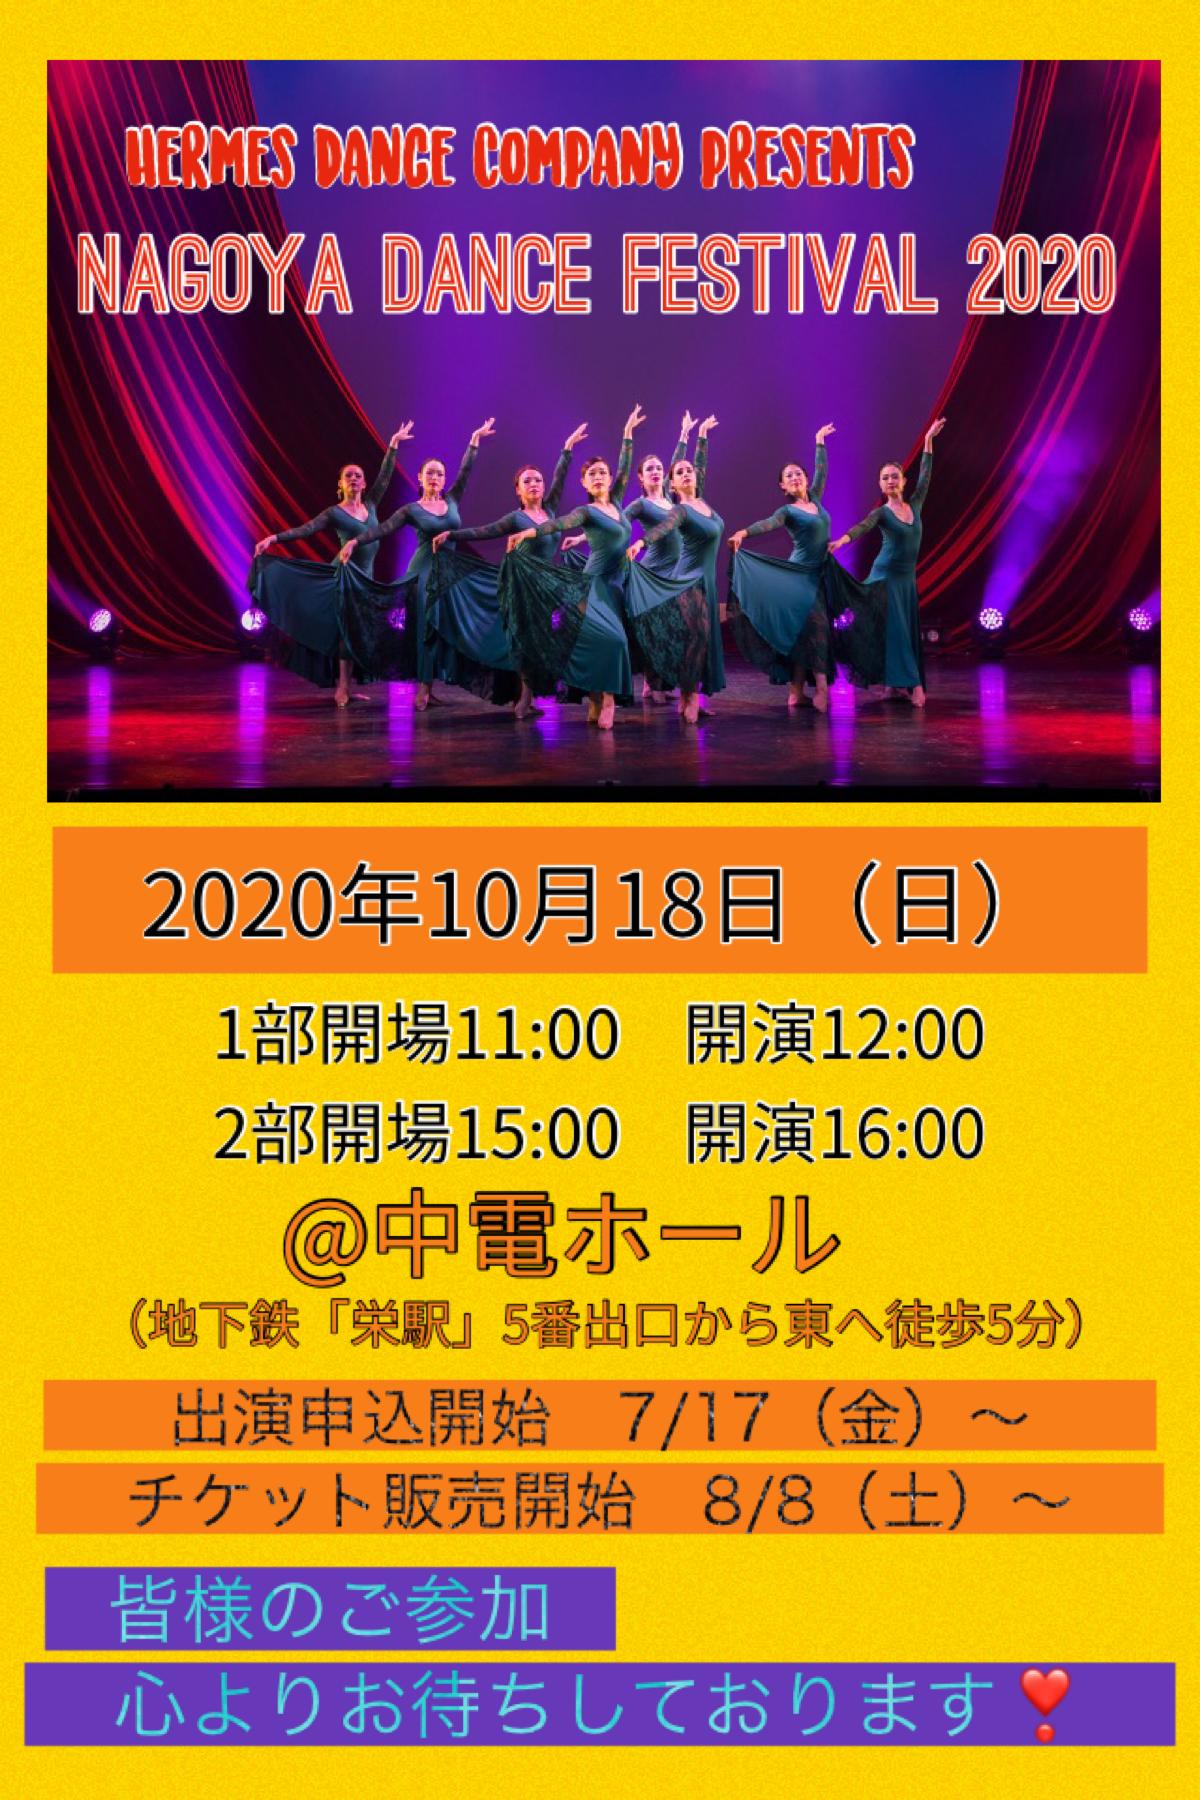 Nagoya Dance Festival 2020開催のお知らせ